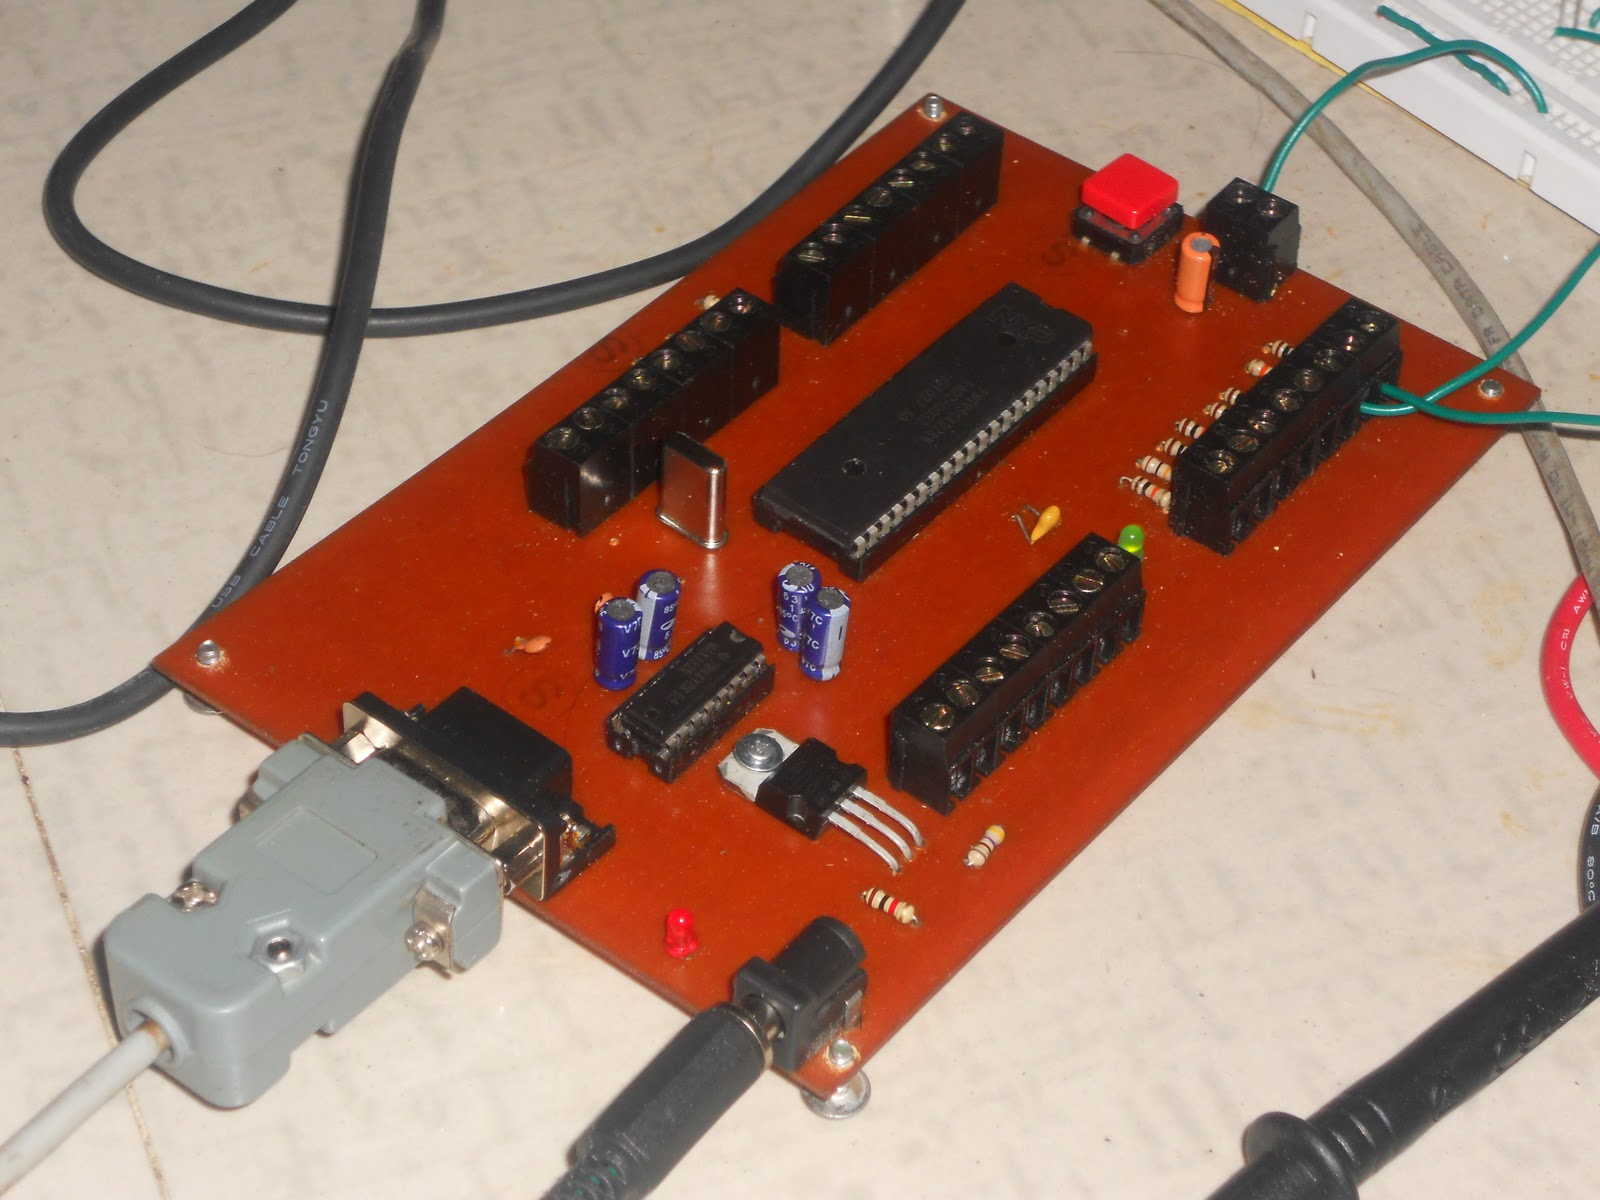 medium resolution of tecfornewbie 8051 isp programmer for nxp design tuturial 8051 programmer development board schematic pcb files 8051programmer